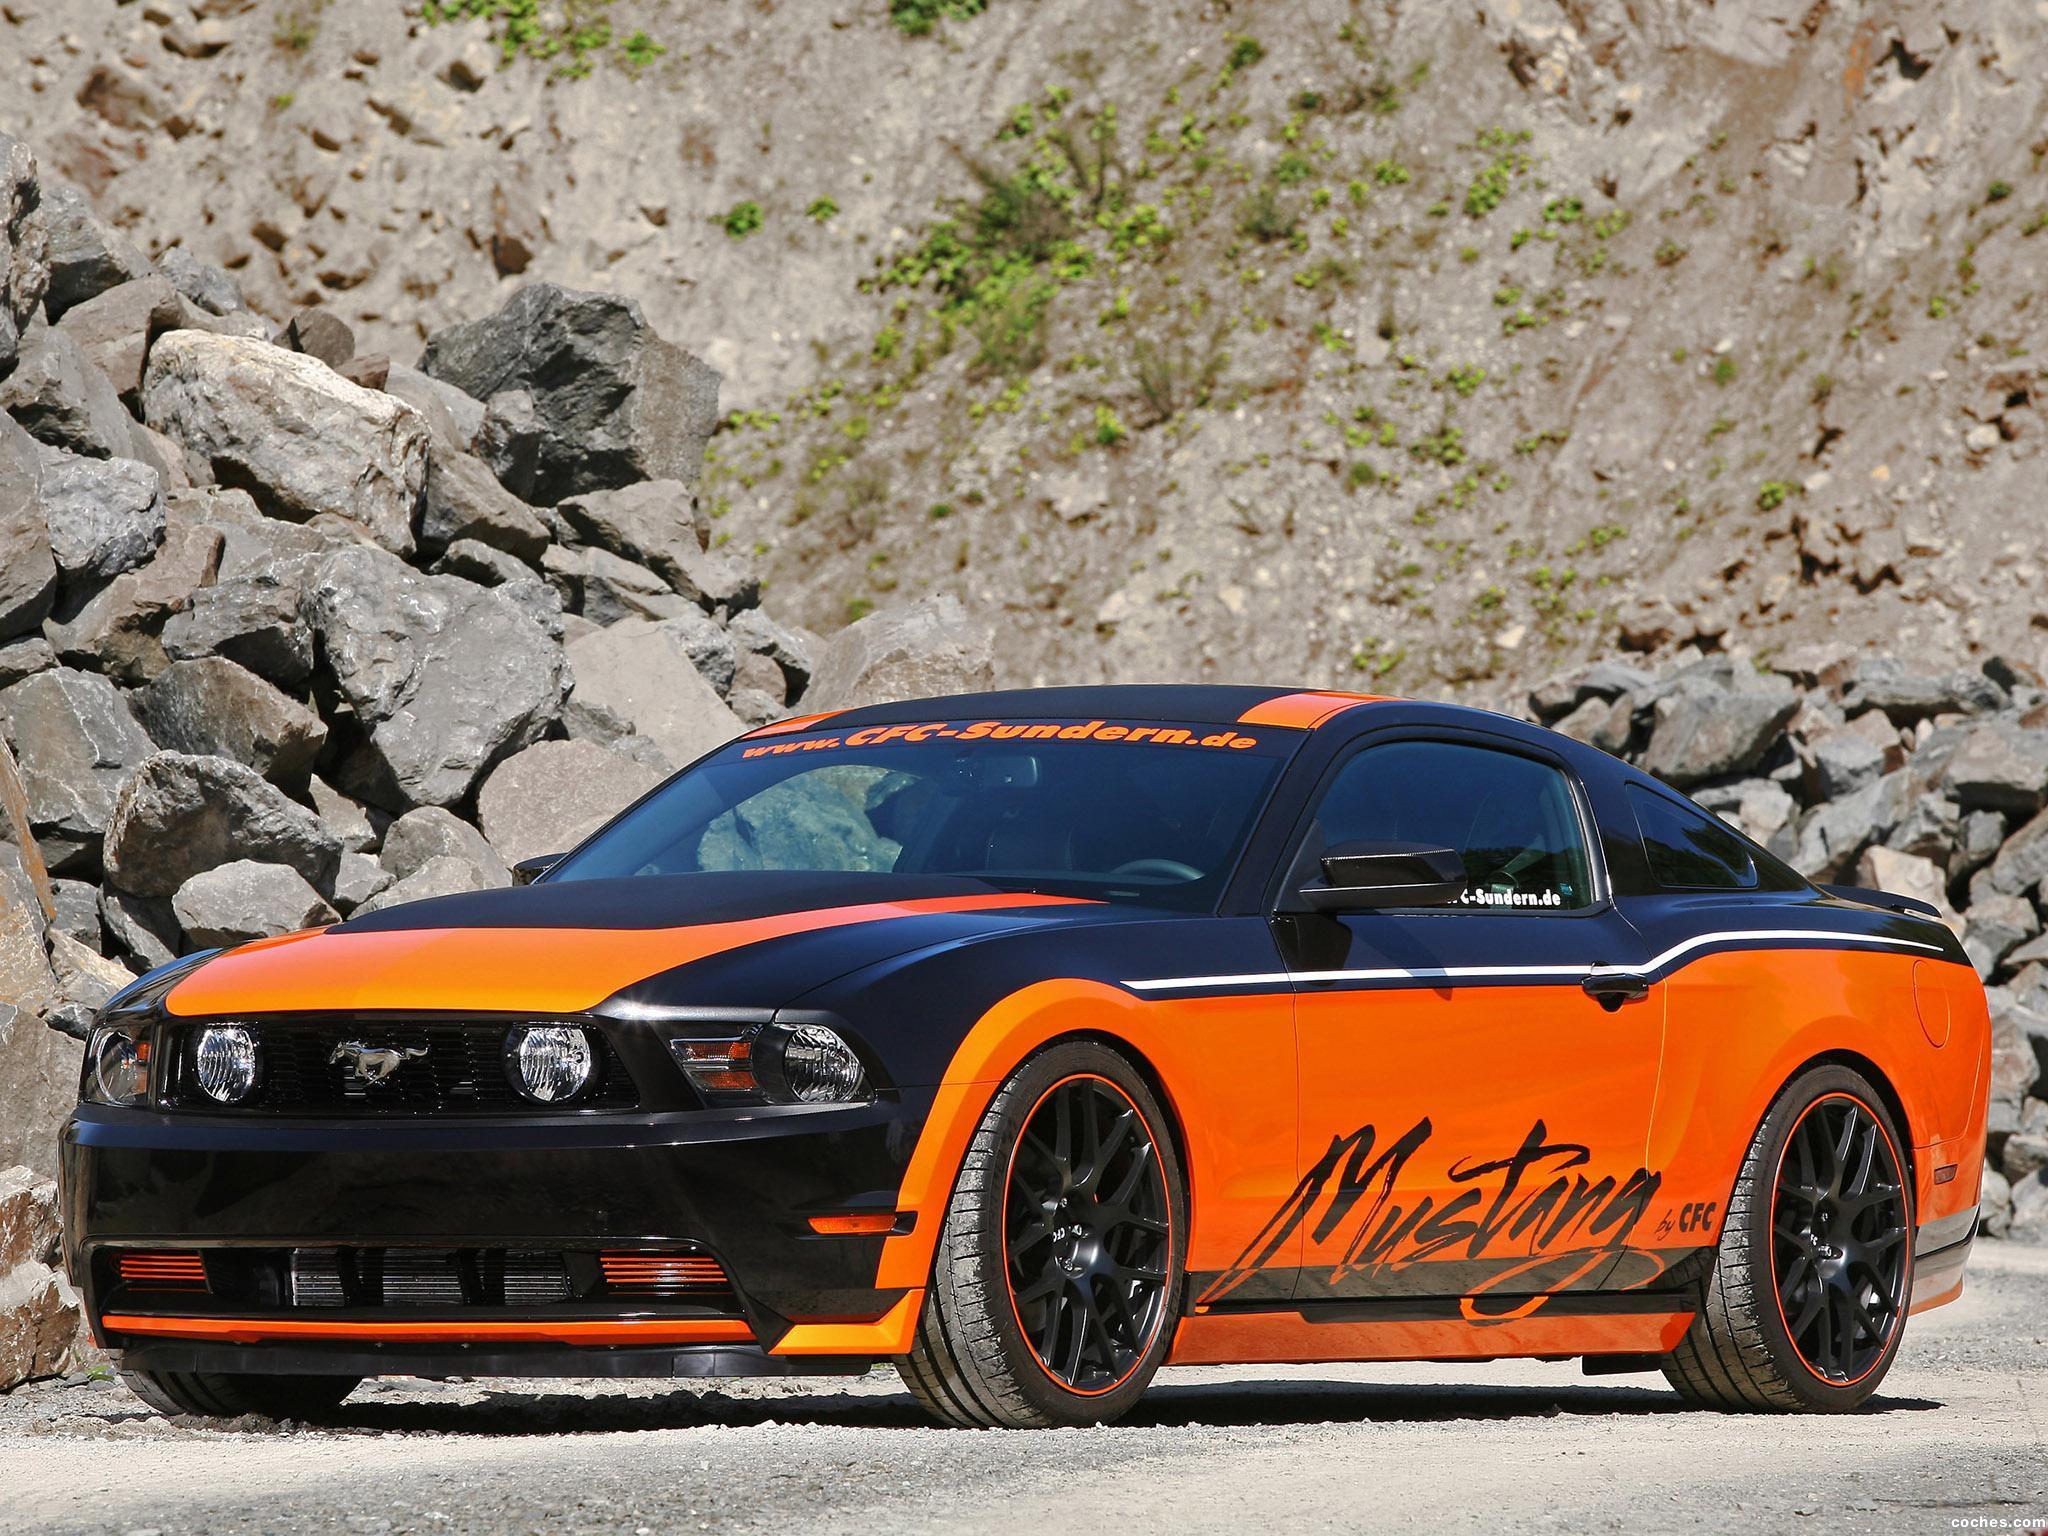 Foto 8 de CFC Ford Mustang Sundern World Marko Mennekes 2011